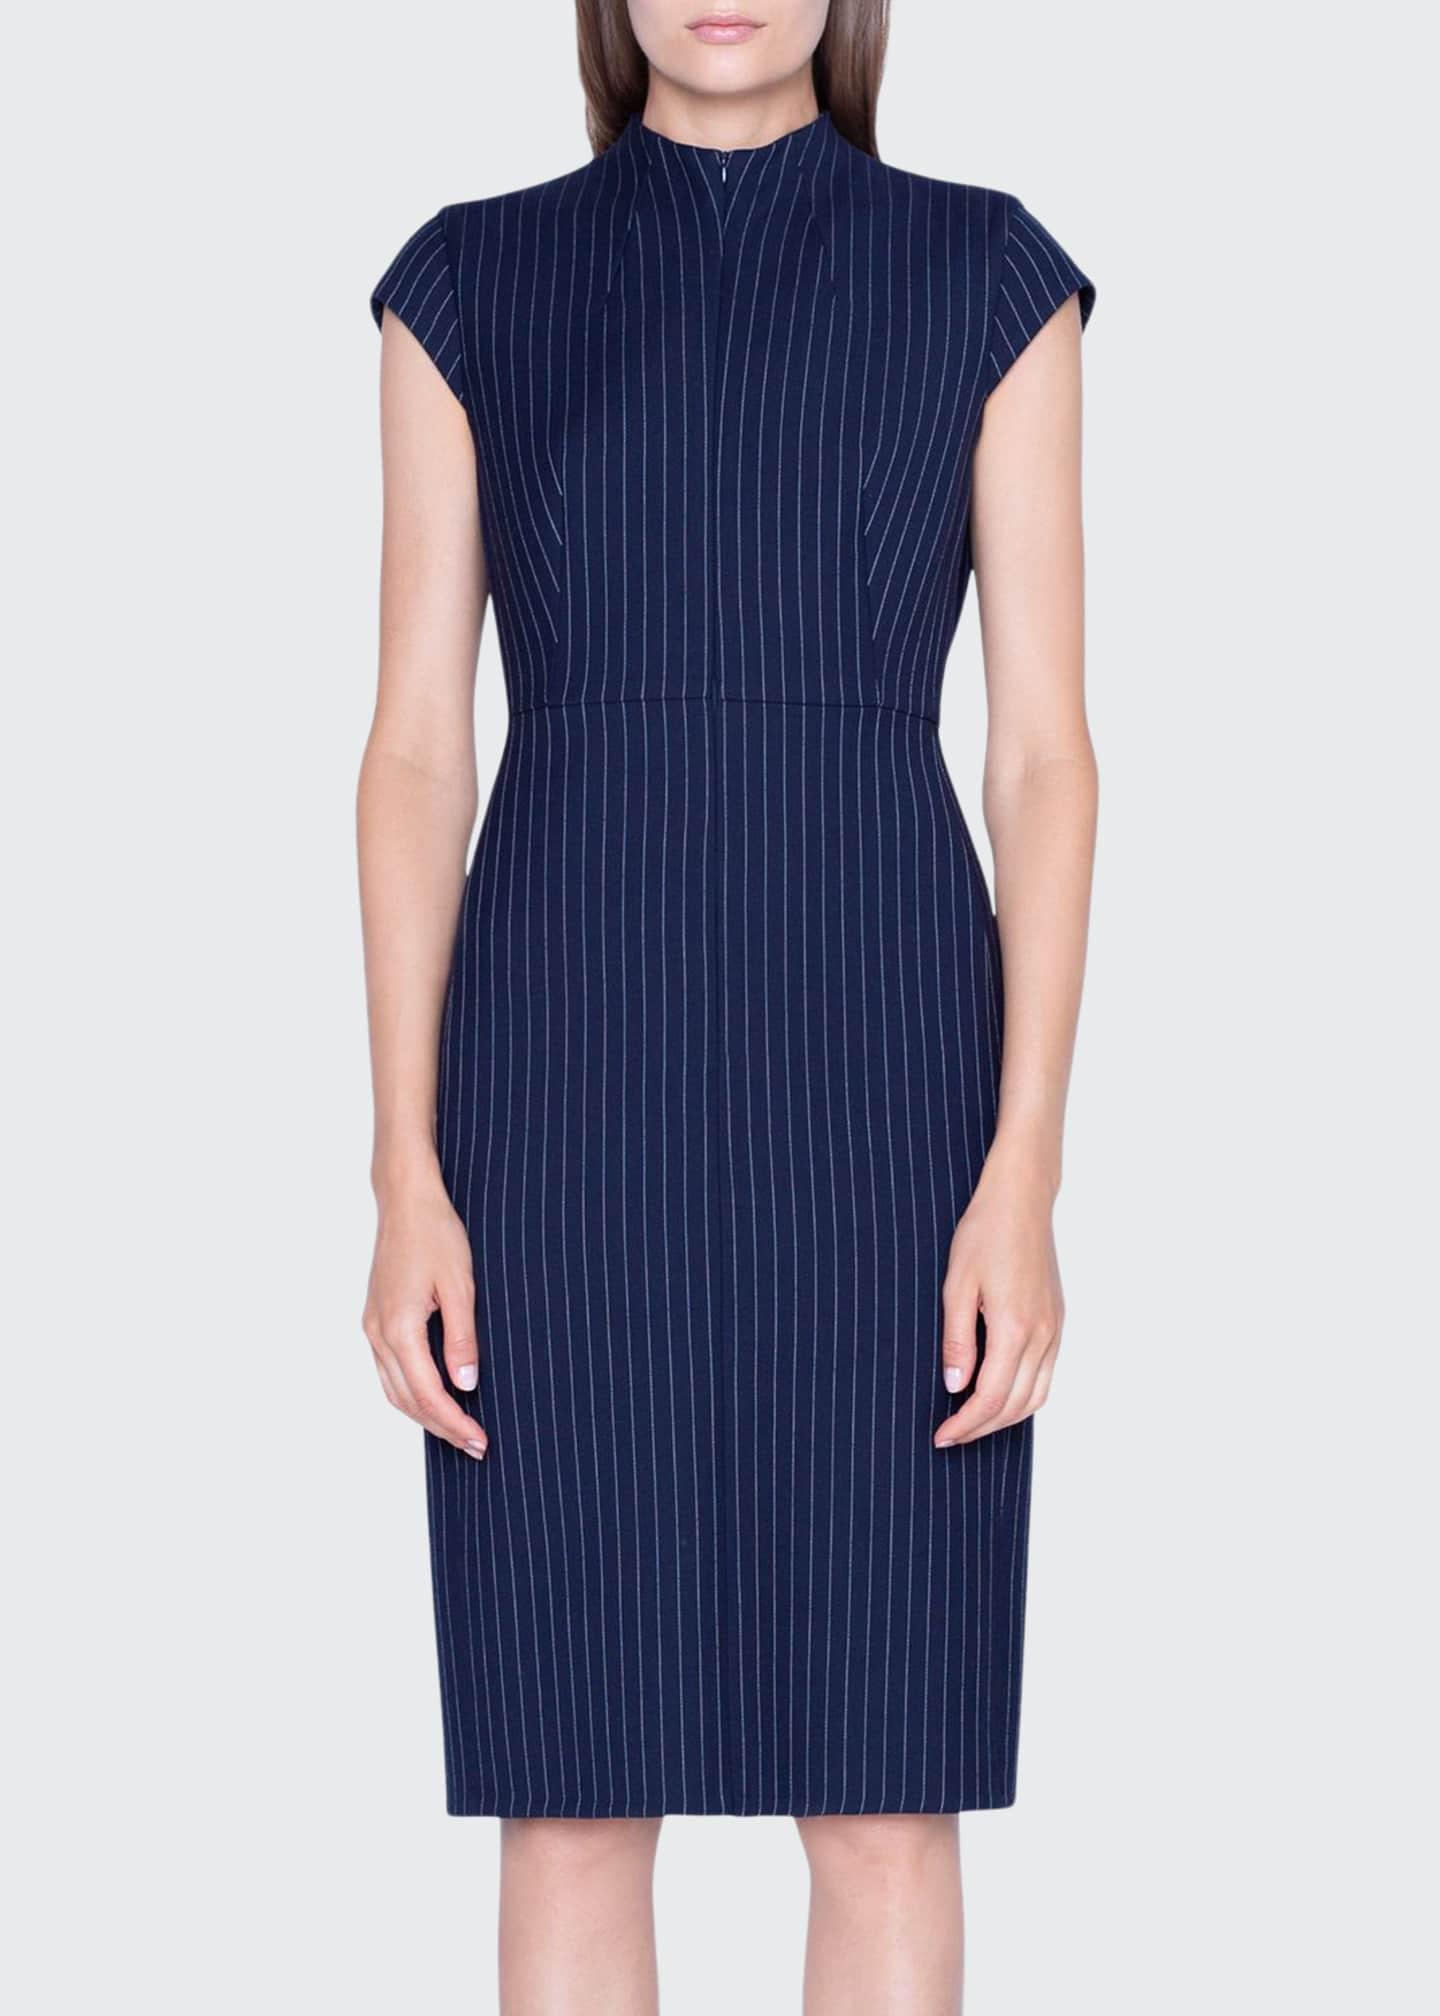 Akris Pinstriped Wool Cap-Sleeve Dress